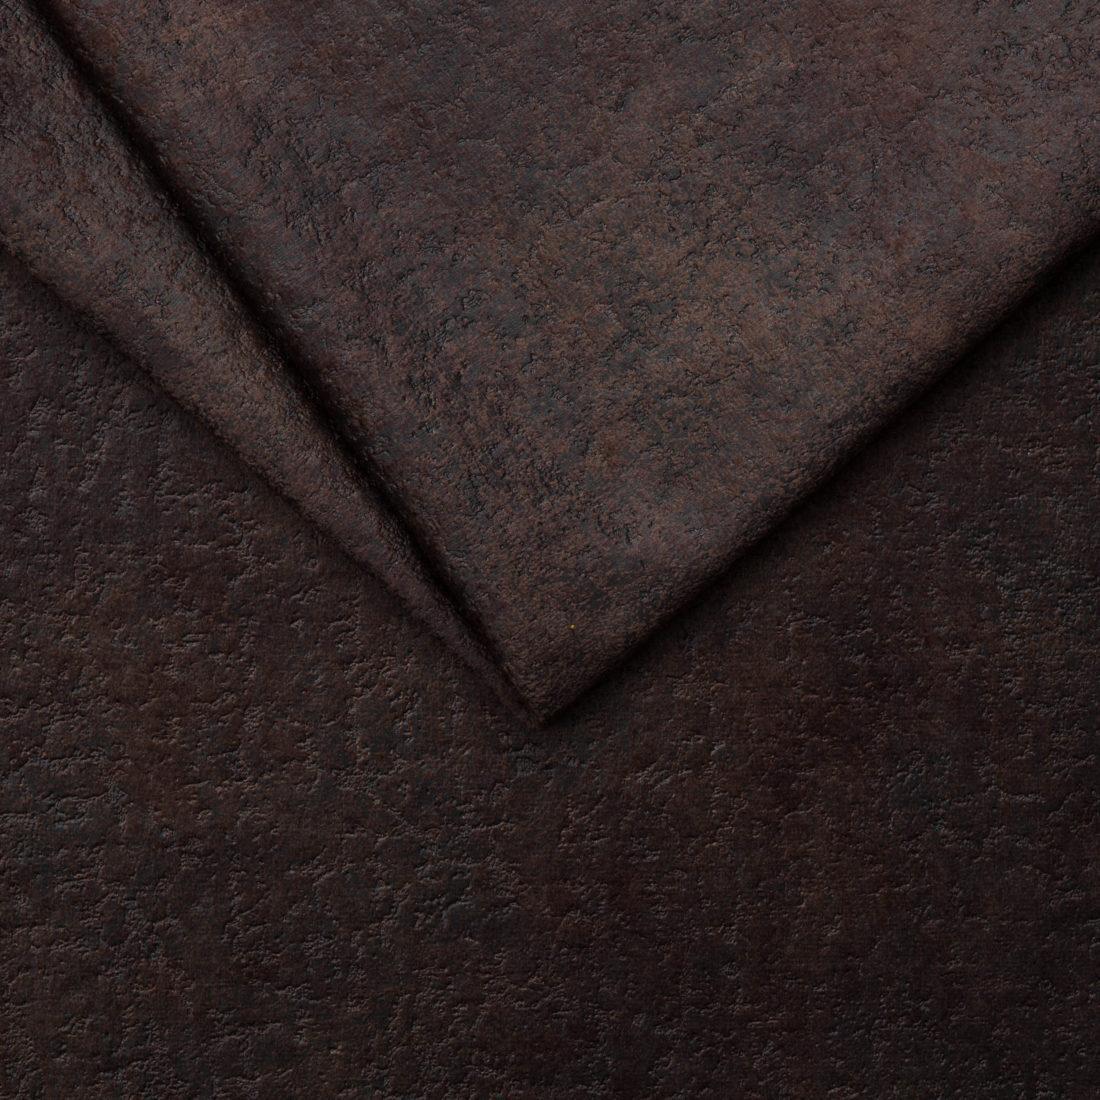 Мебельная ткань Infinity 6 Chocolate, велюр